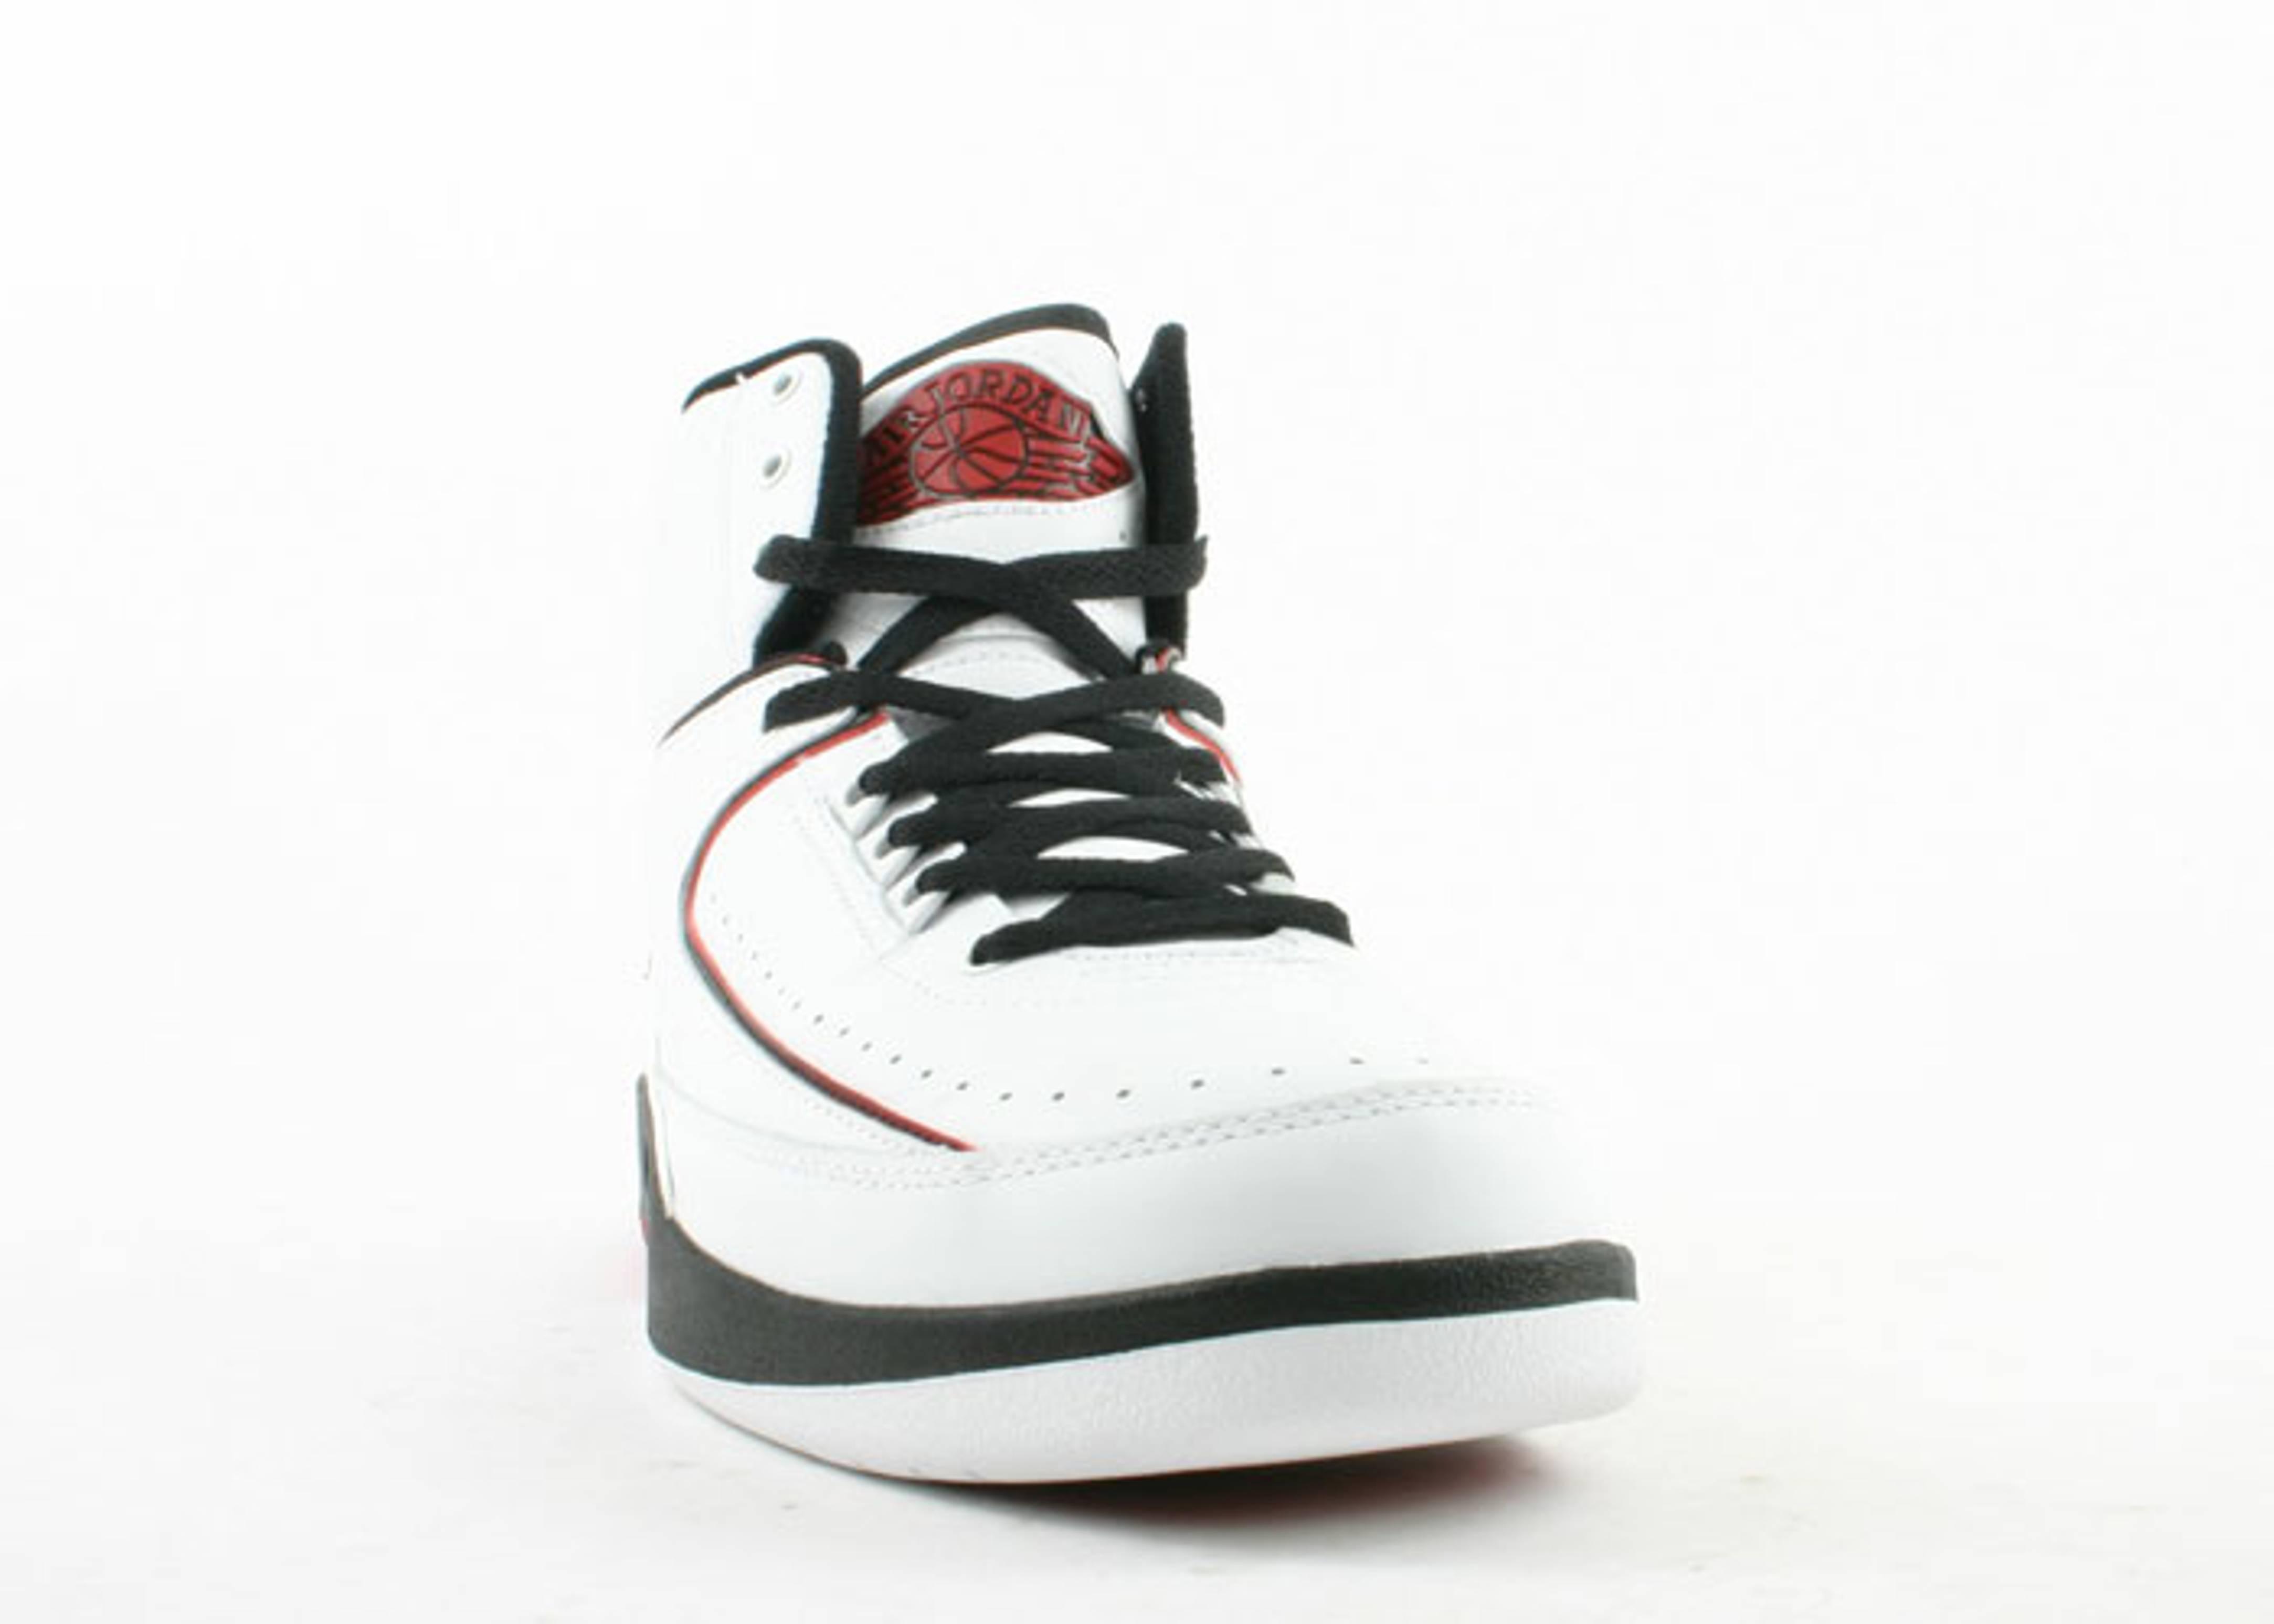 a6a378c482b Air Jordan 2 Retro - Air Jordan - 308308 161 - white/varsity red ...